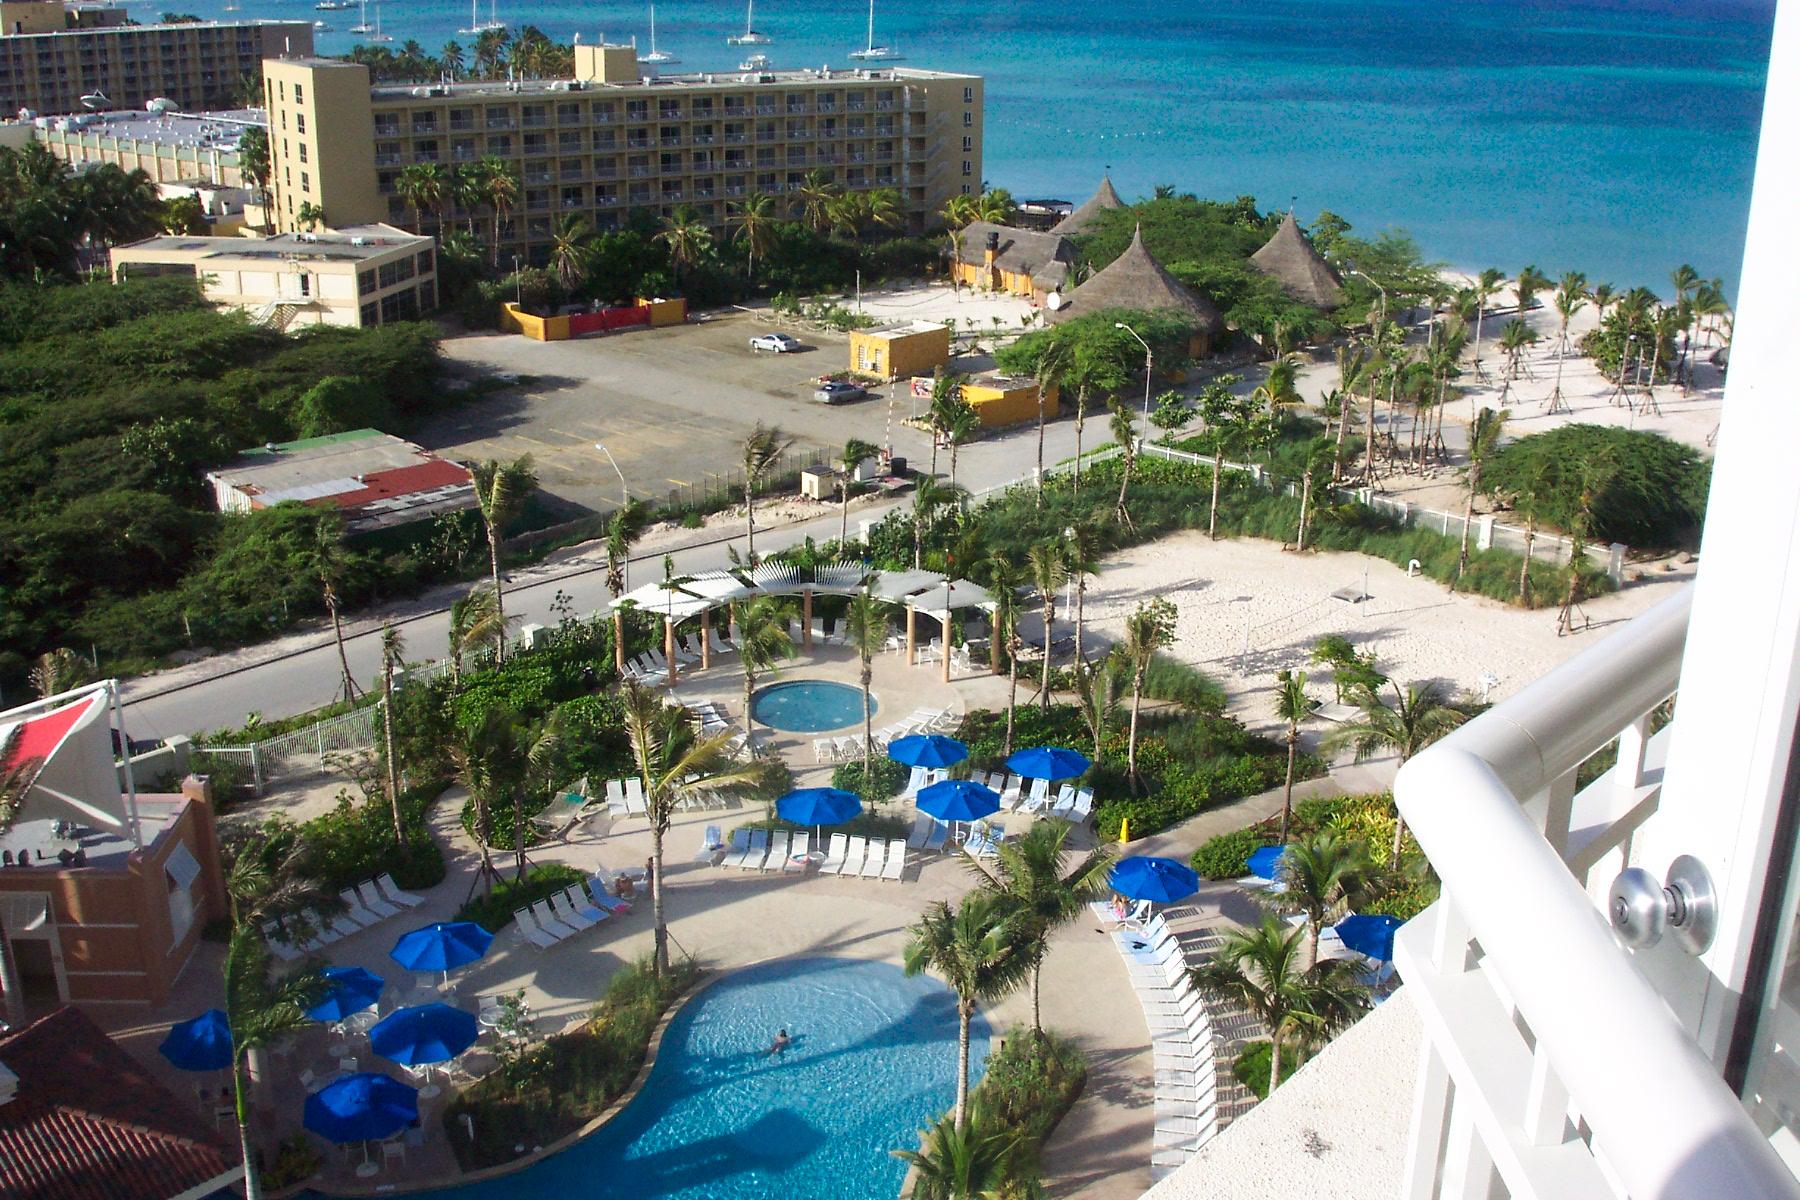 Marriott Aruba Surf Club image